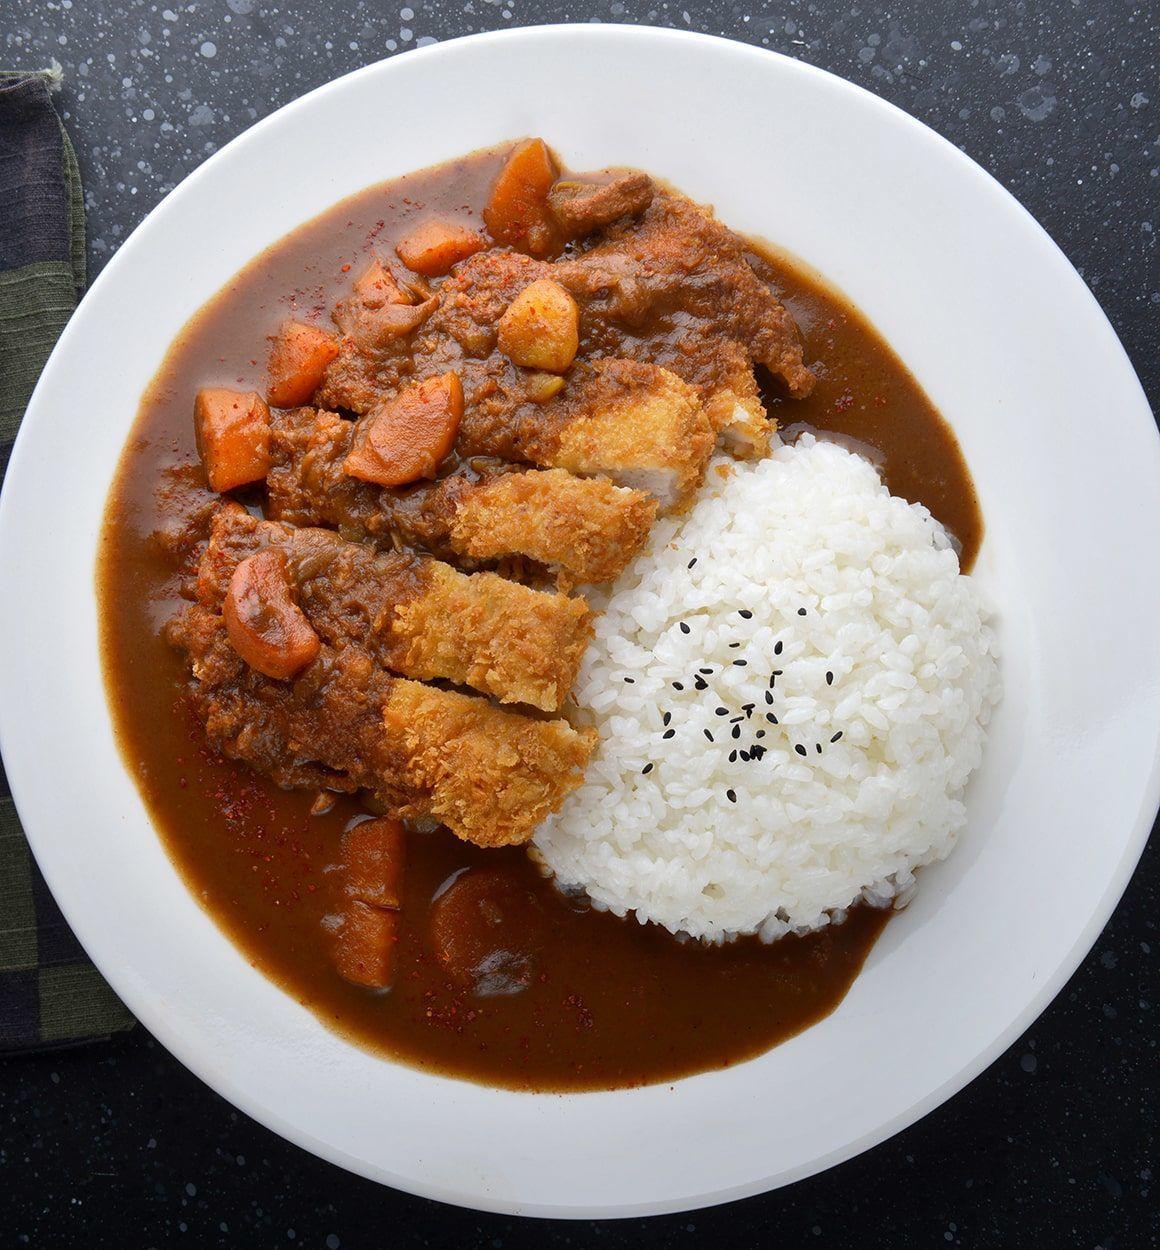 Chicken Katsu Curry Recipe Ninja Ninja Foodi 6 5 Qt The Pressure Cooker That Crisps Op30 Katsu Curry Recipes Chicken Katsu Curry Recipes Food Dishes